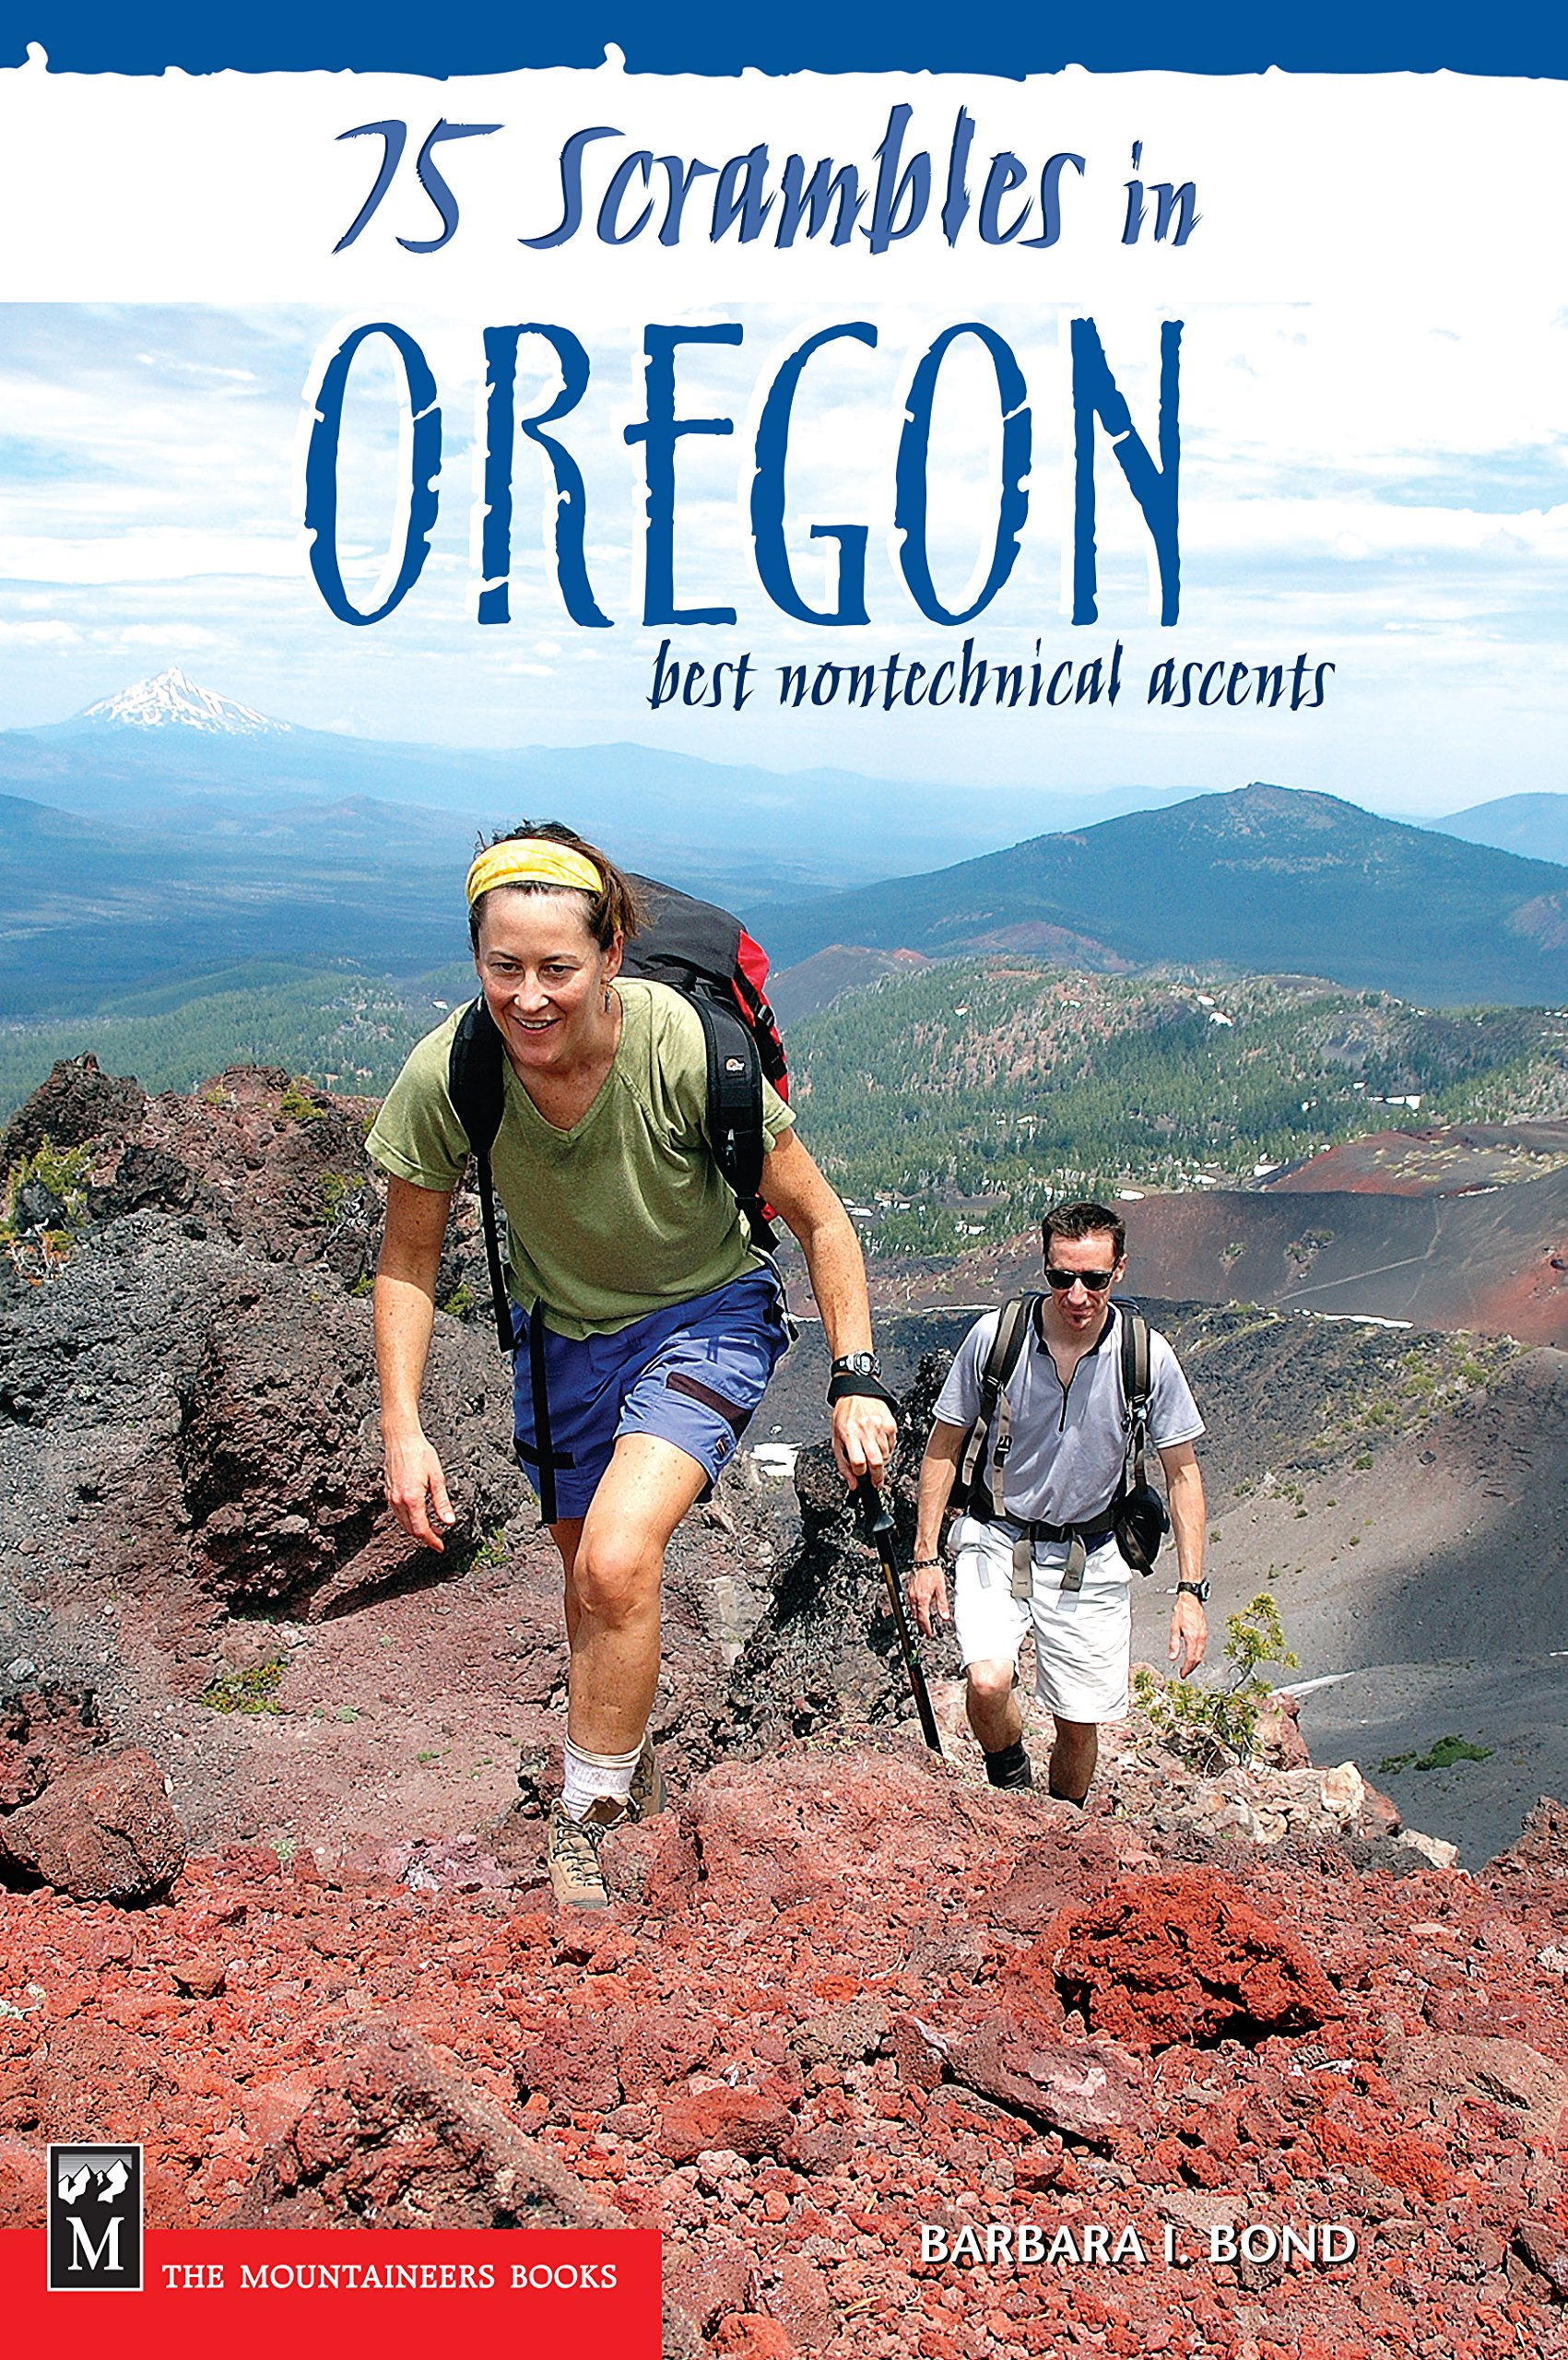 Read Online 75 Scrambles in Oregon: Best Non-technical Ascents pdf epub